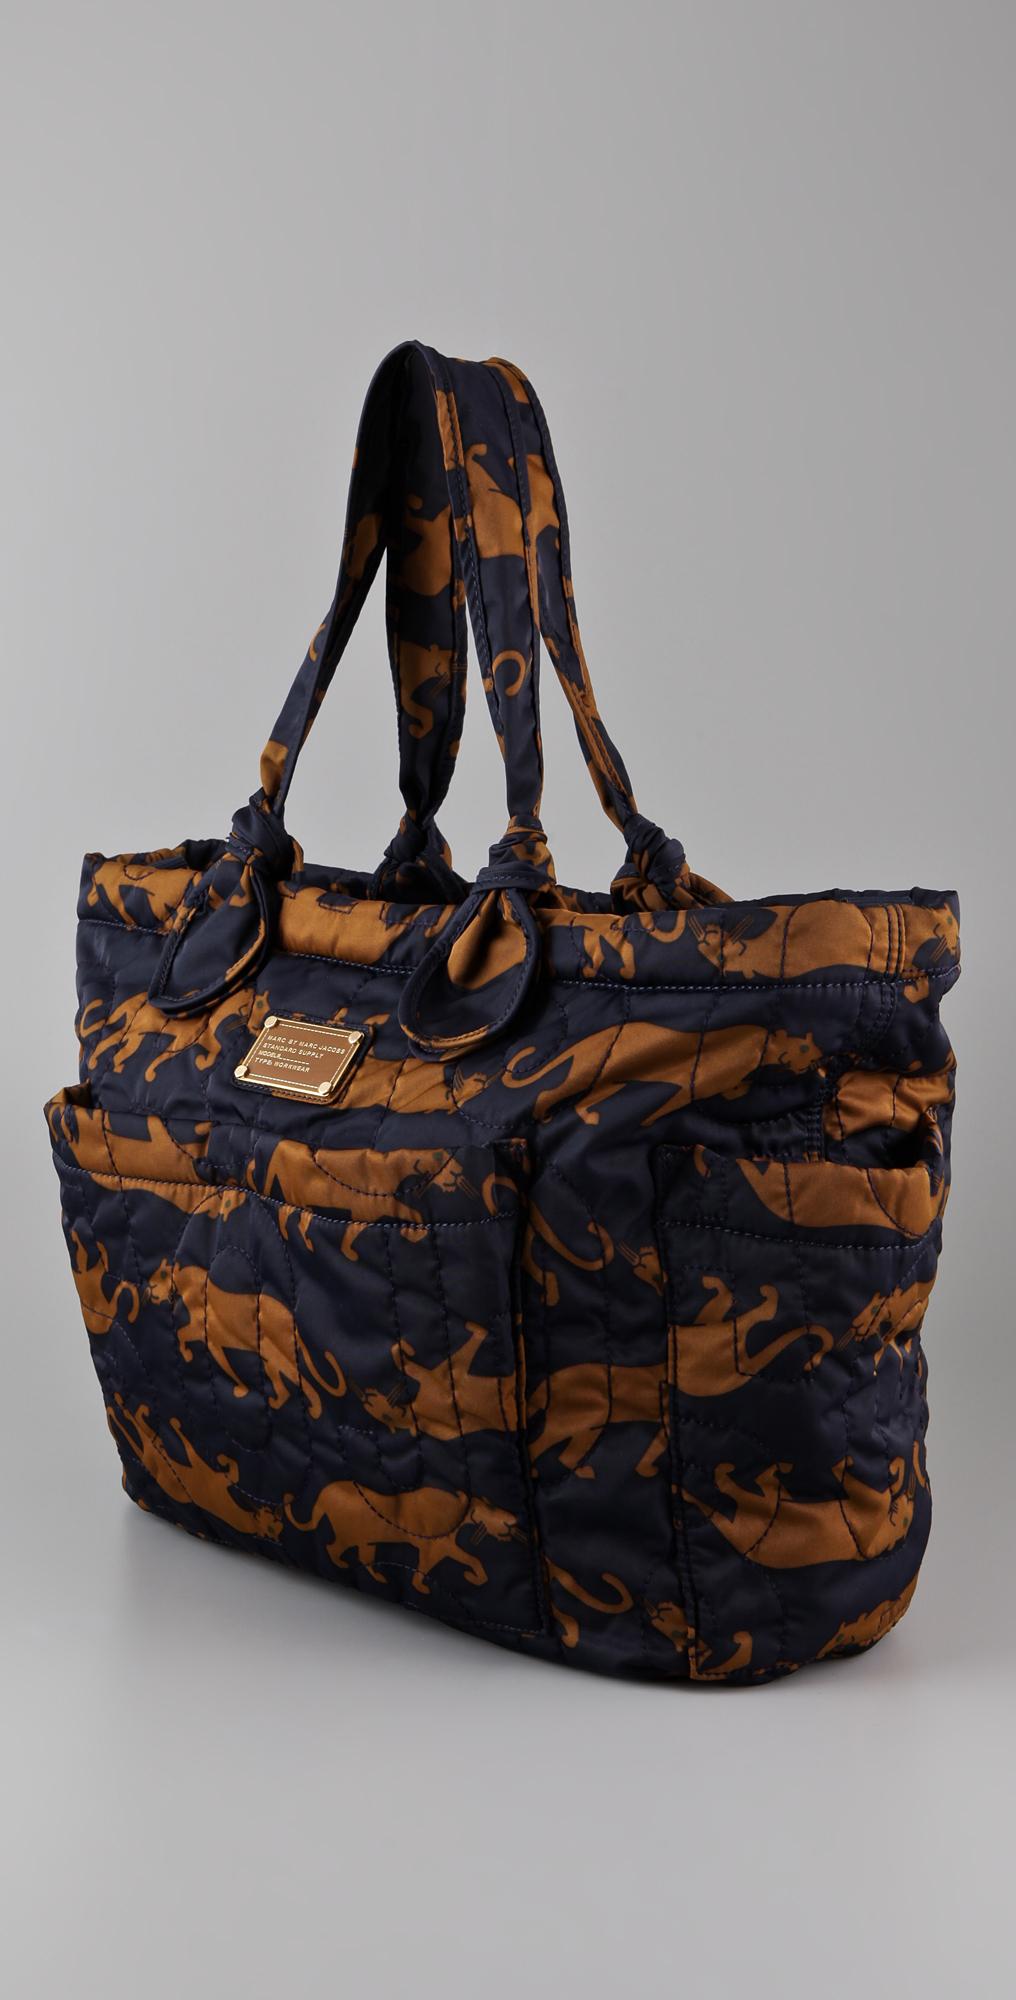 7fb7ee4cb0a1 Marc by Marc Jacobs Pretty Nylon Eliz-a-Baby Bag